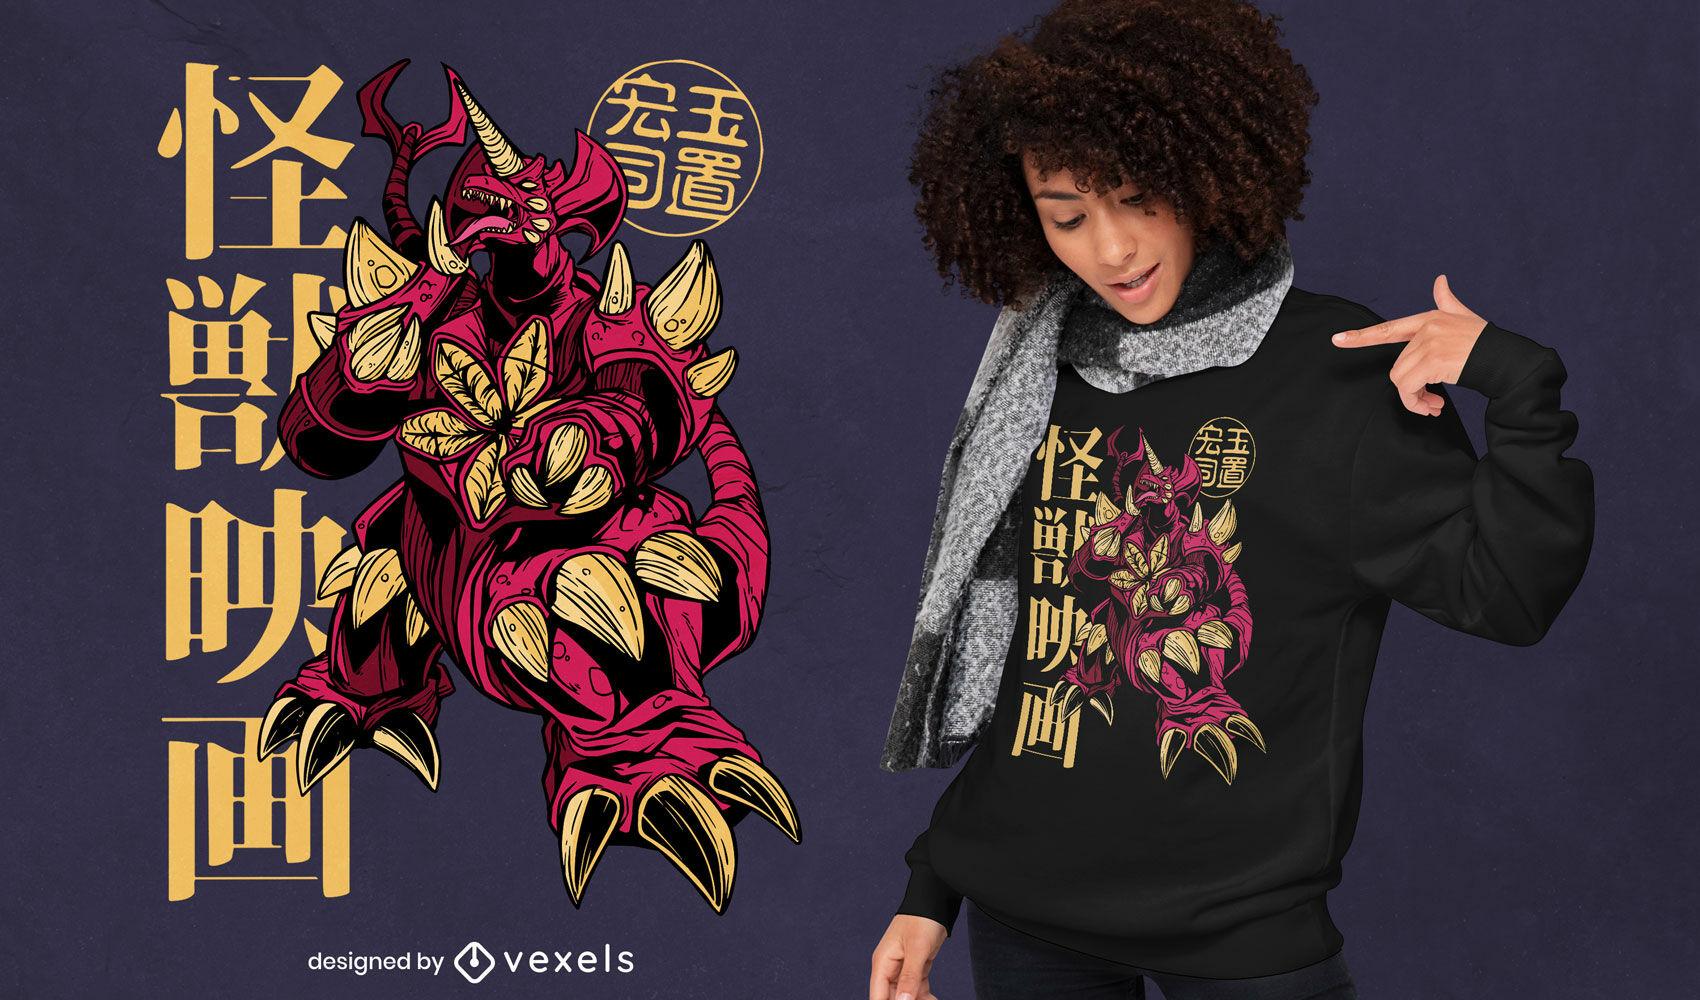 Demon kaiju monster japanese t-shirt design